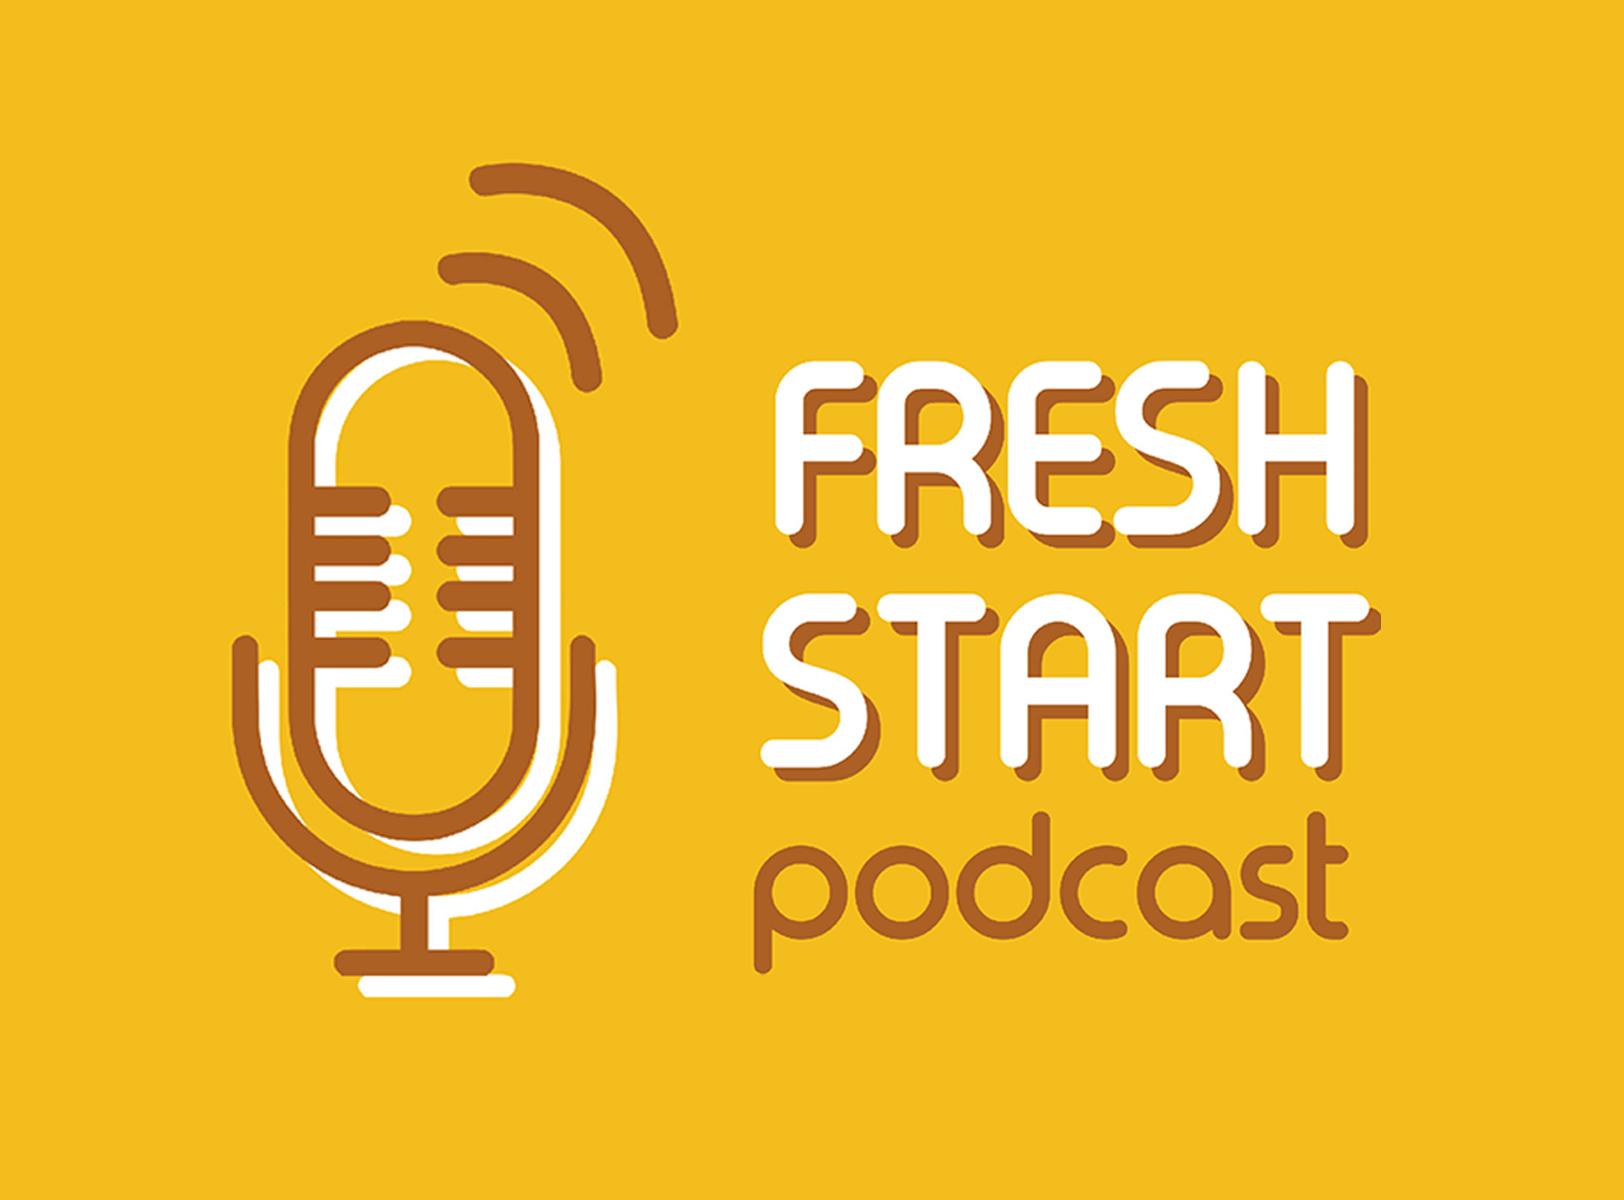 Fresh Start: Podcast News (4/21/2019 Sun.)